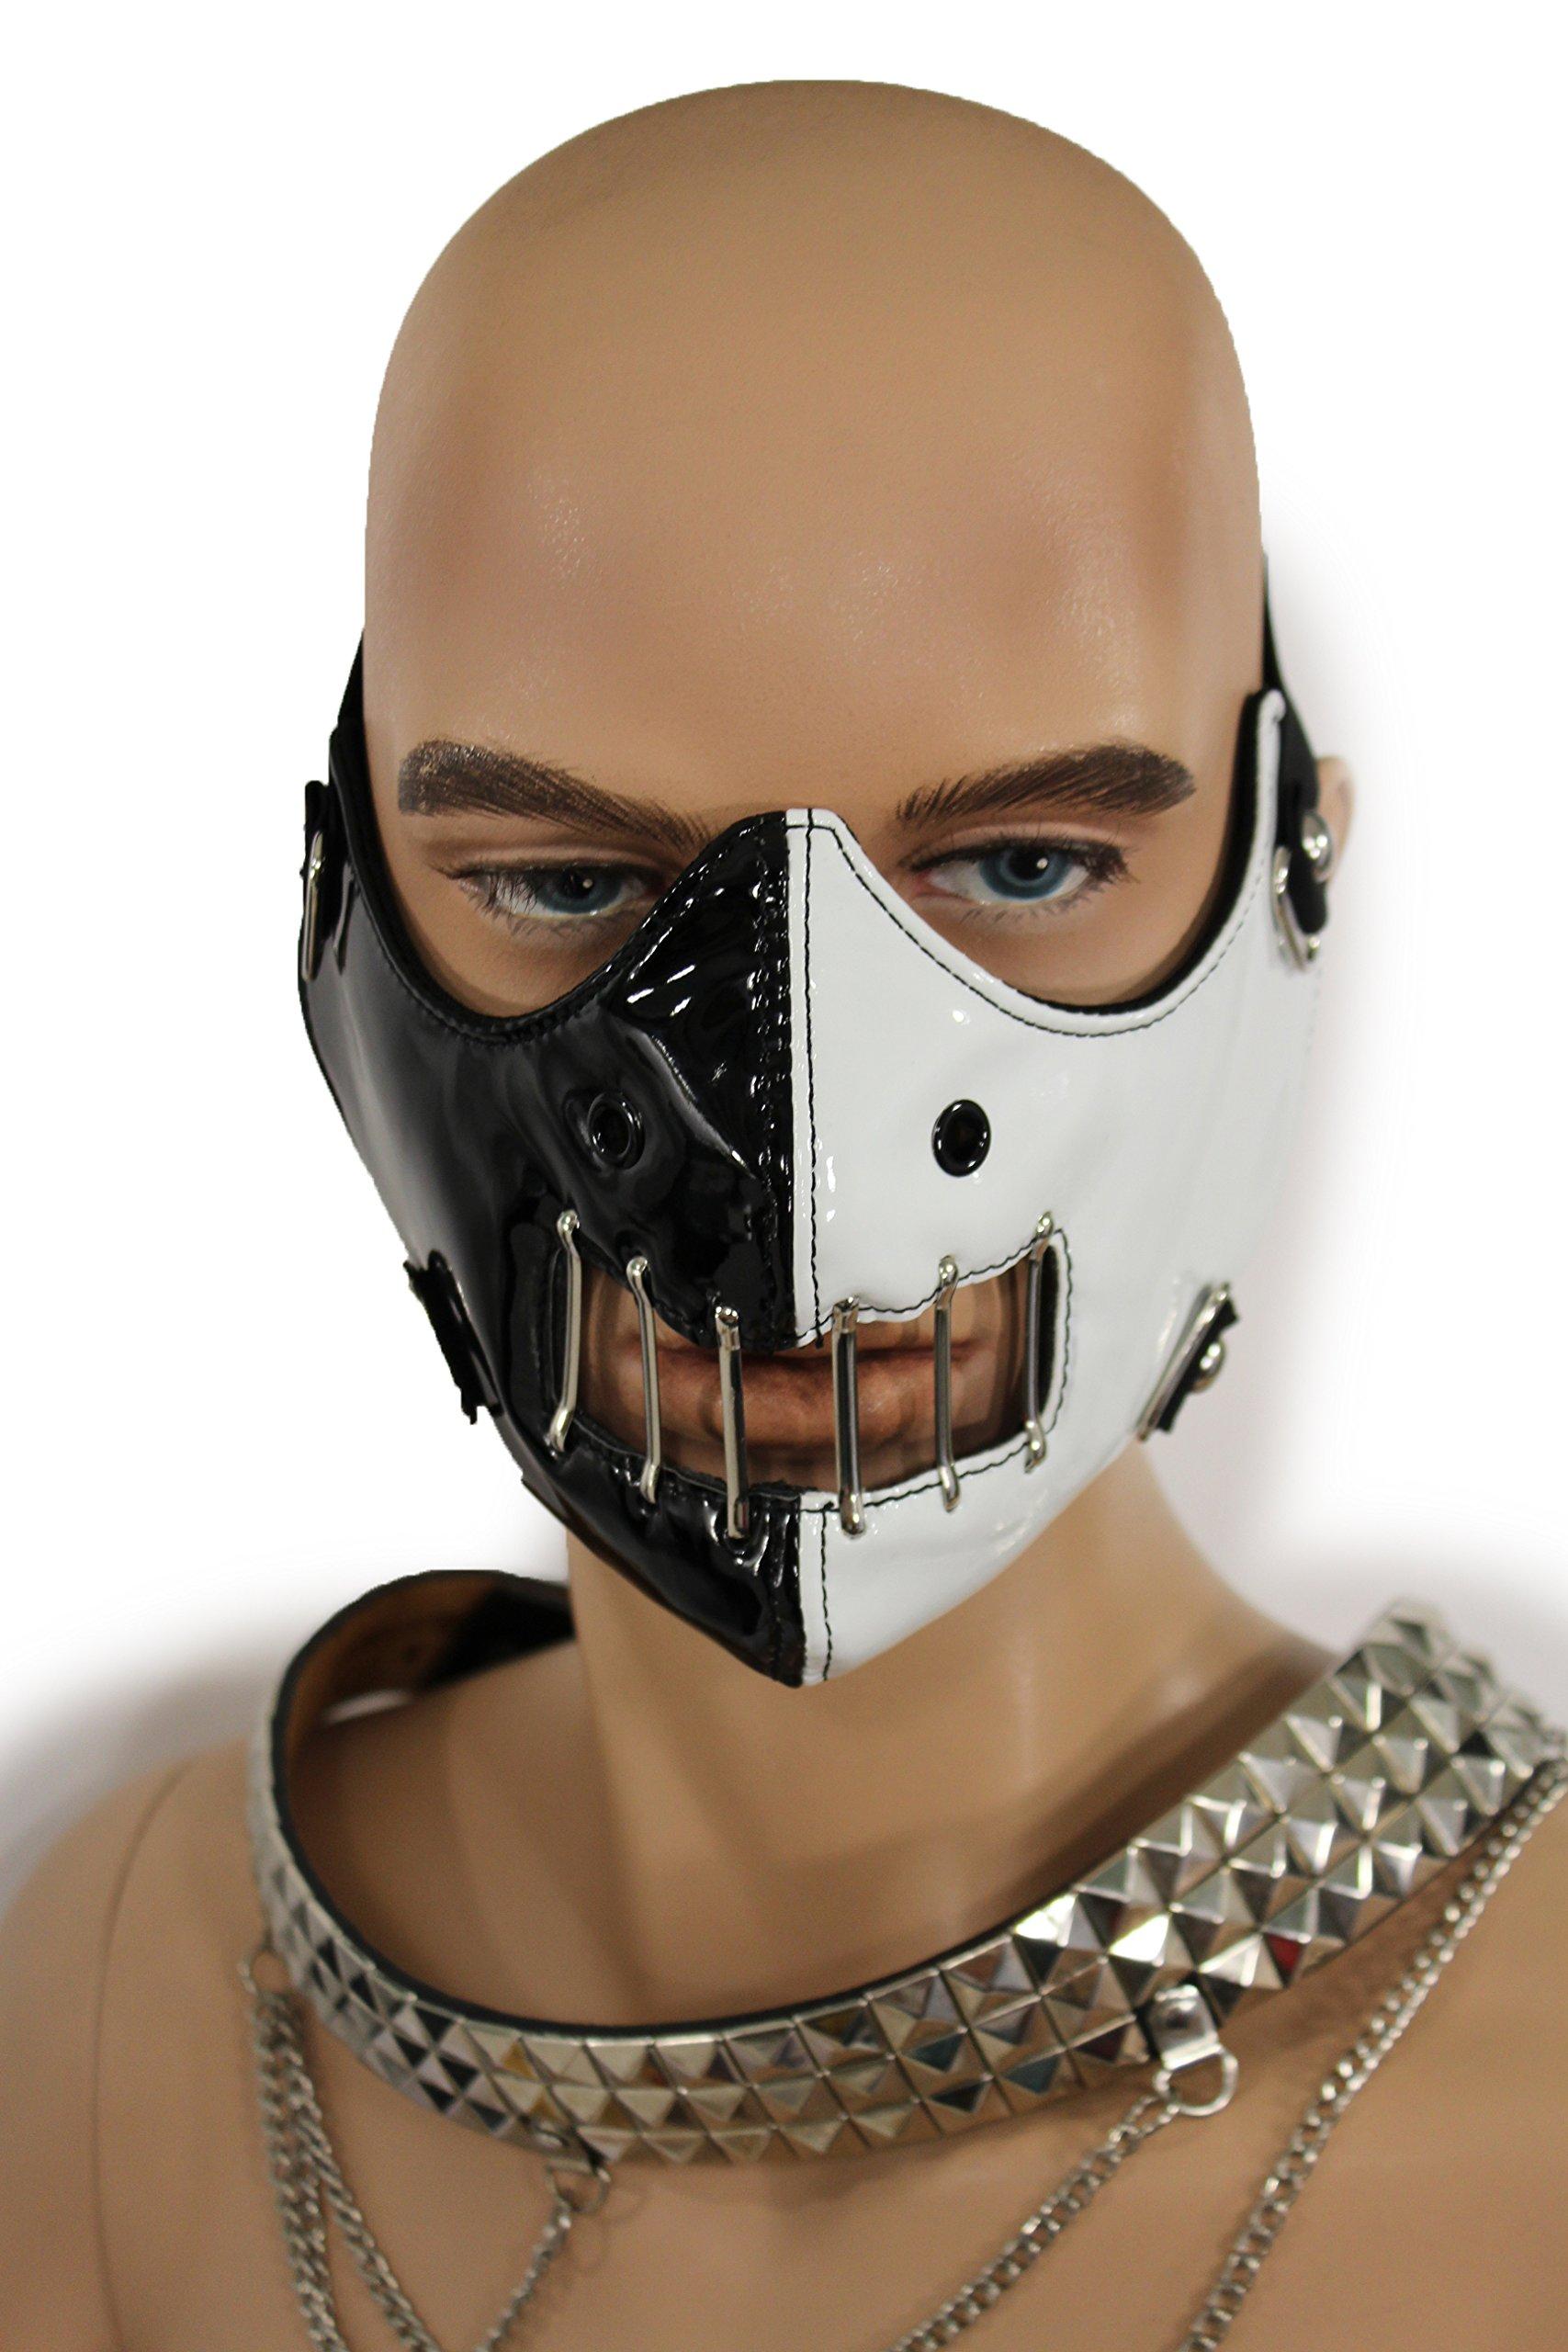 TFJ Men Mouth Muzzel Halloween Half Face Hannibal Mask S&m Costume Scary Black White